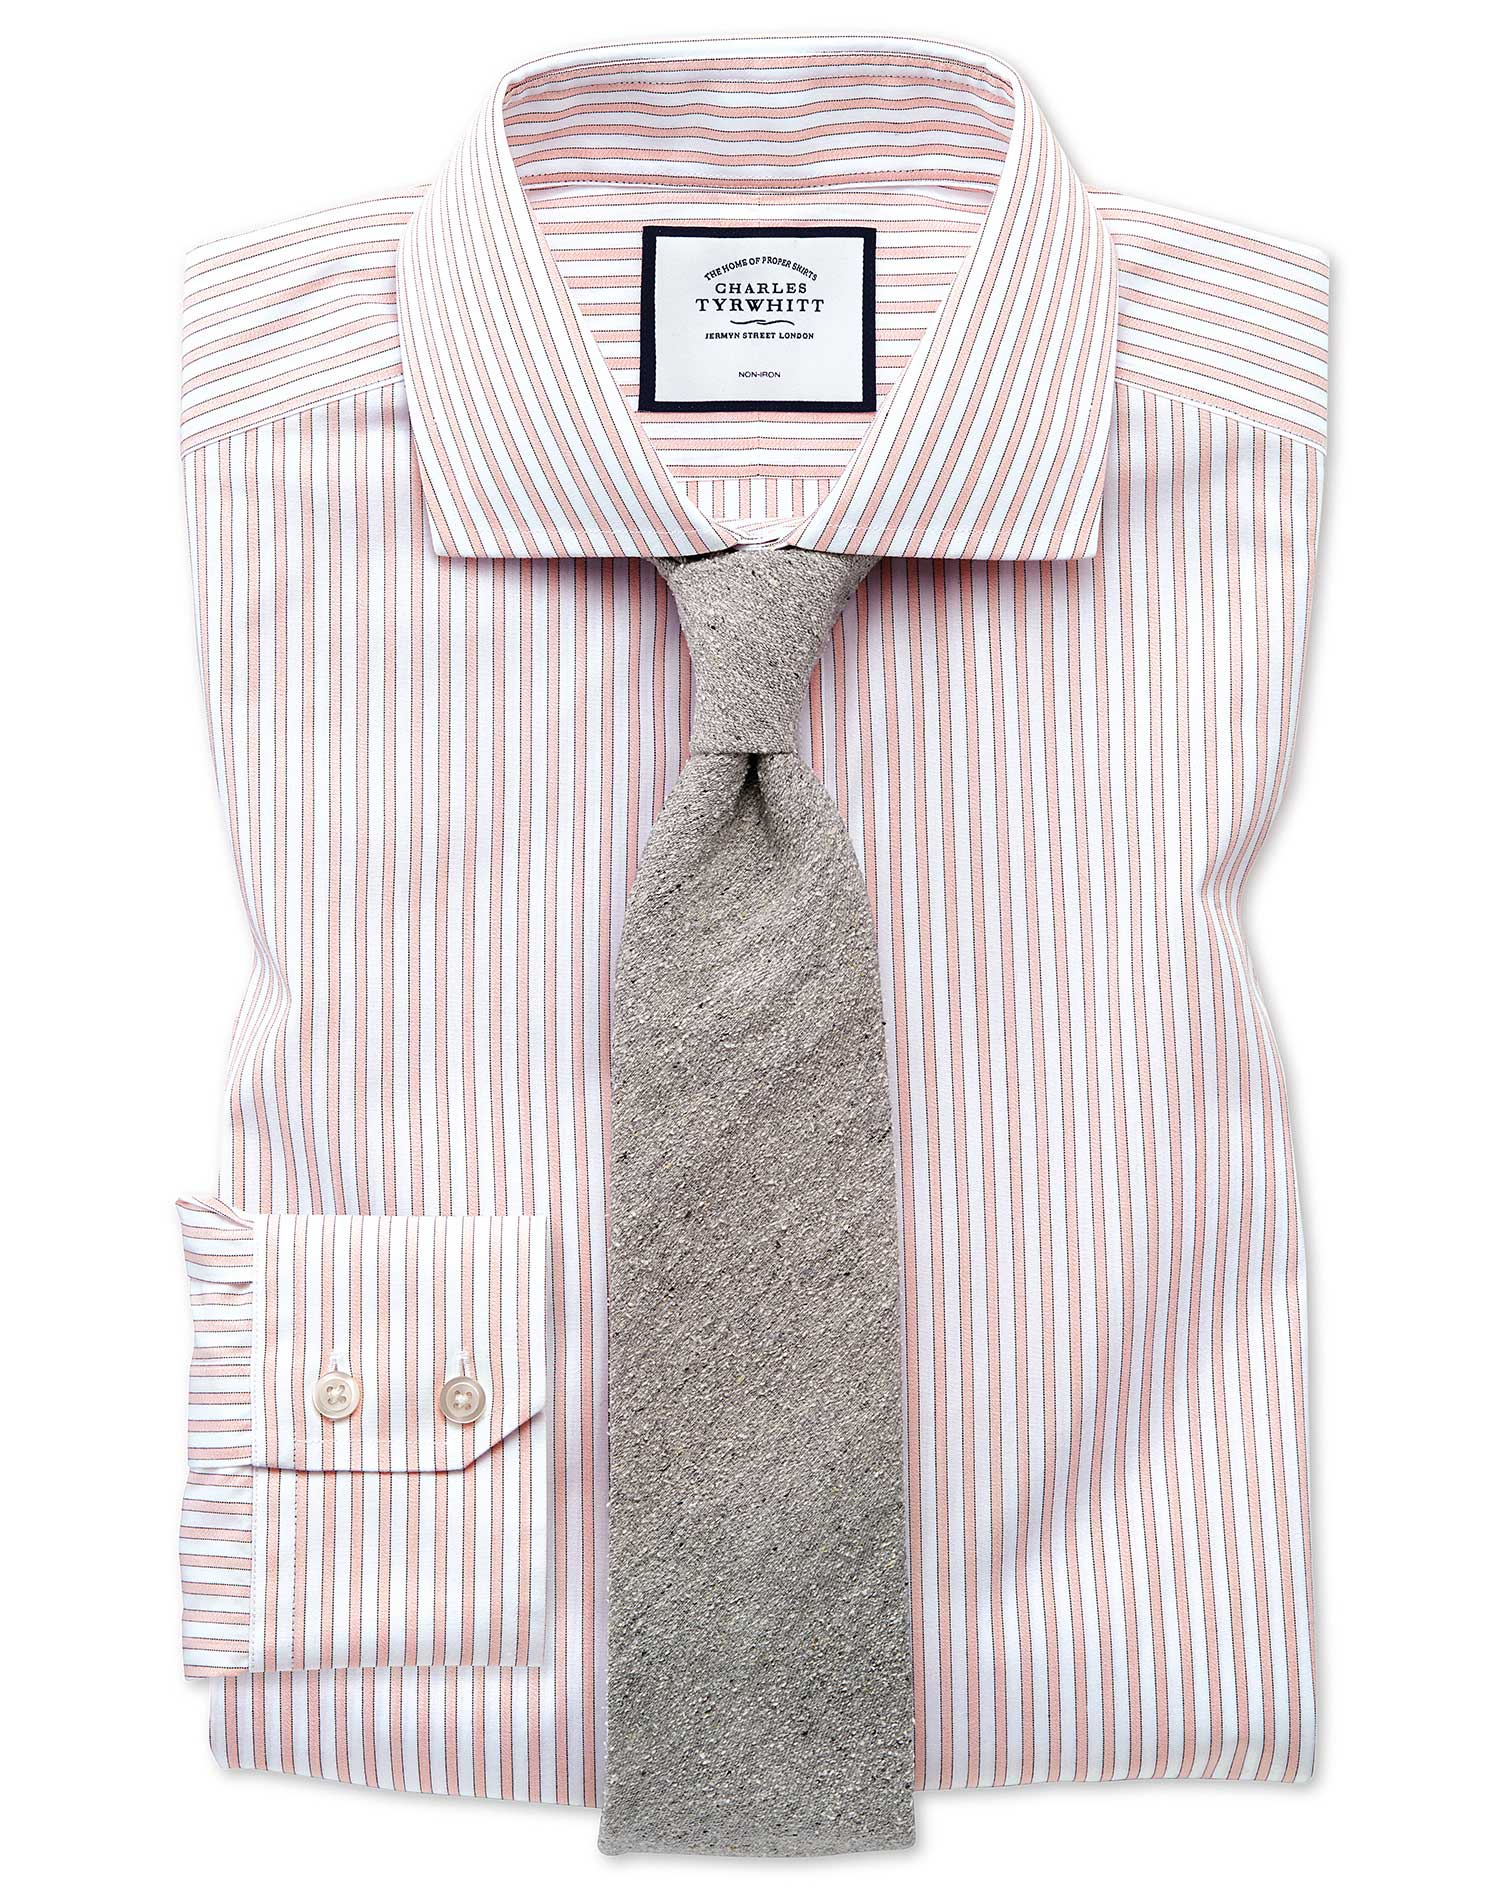 Slim Fit Non-Iron Shadow Stripe Pink Cotton Formal Shirt Single Cuff Size 16/33 by Charles Tyrwhitt